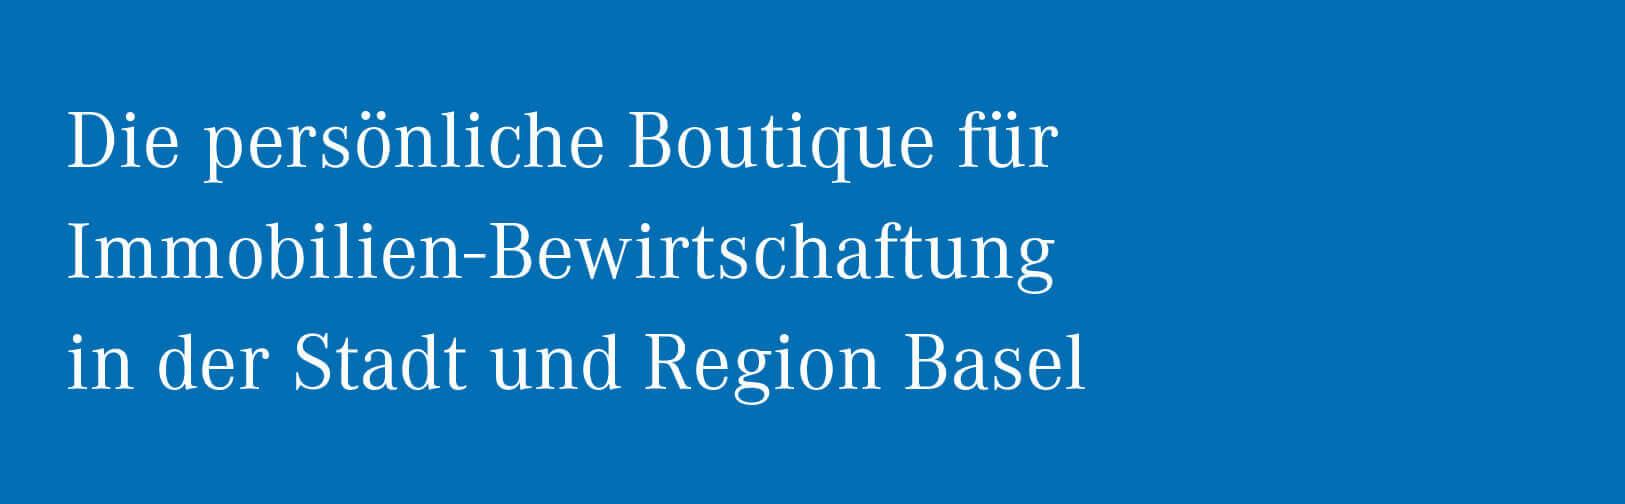 Liegenschaftsverwaltungen Basel